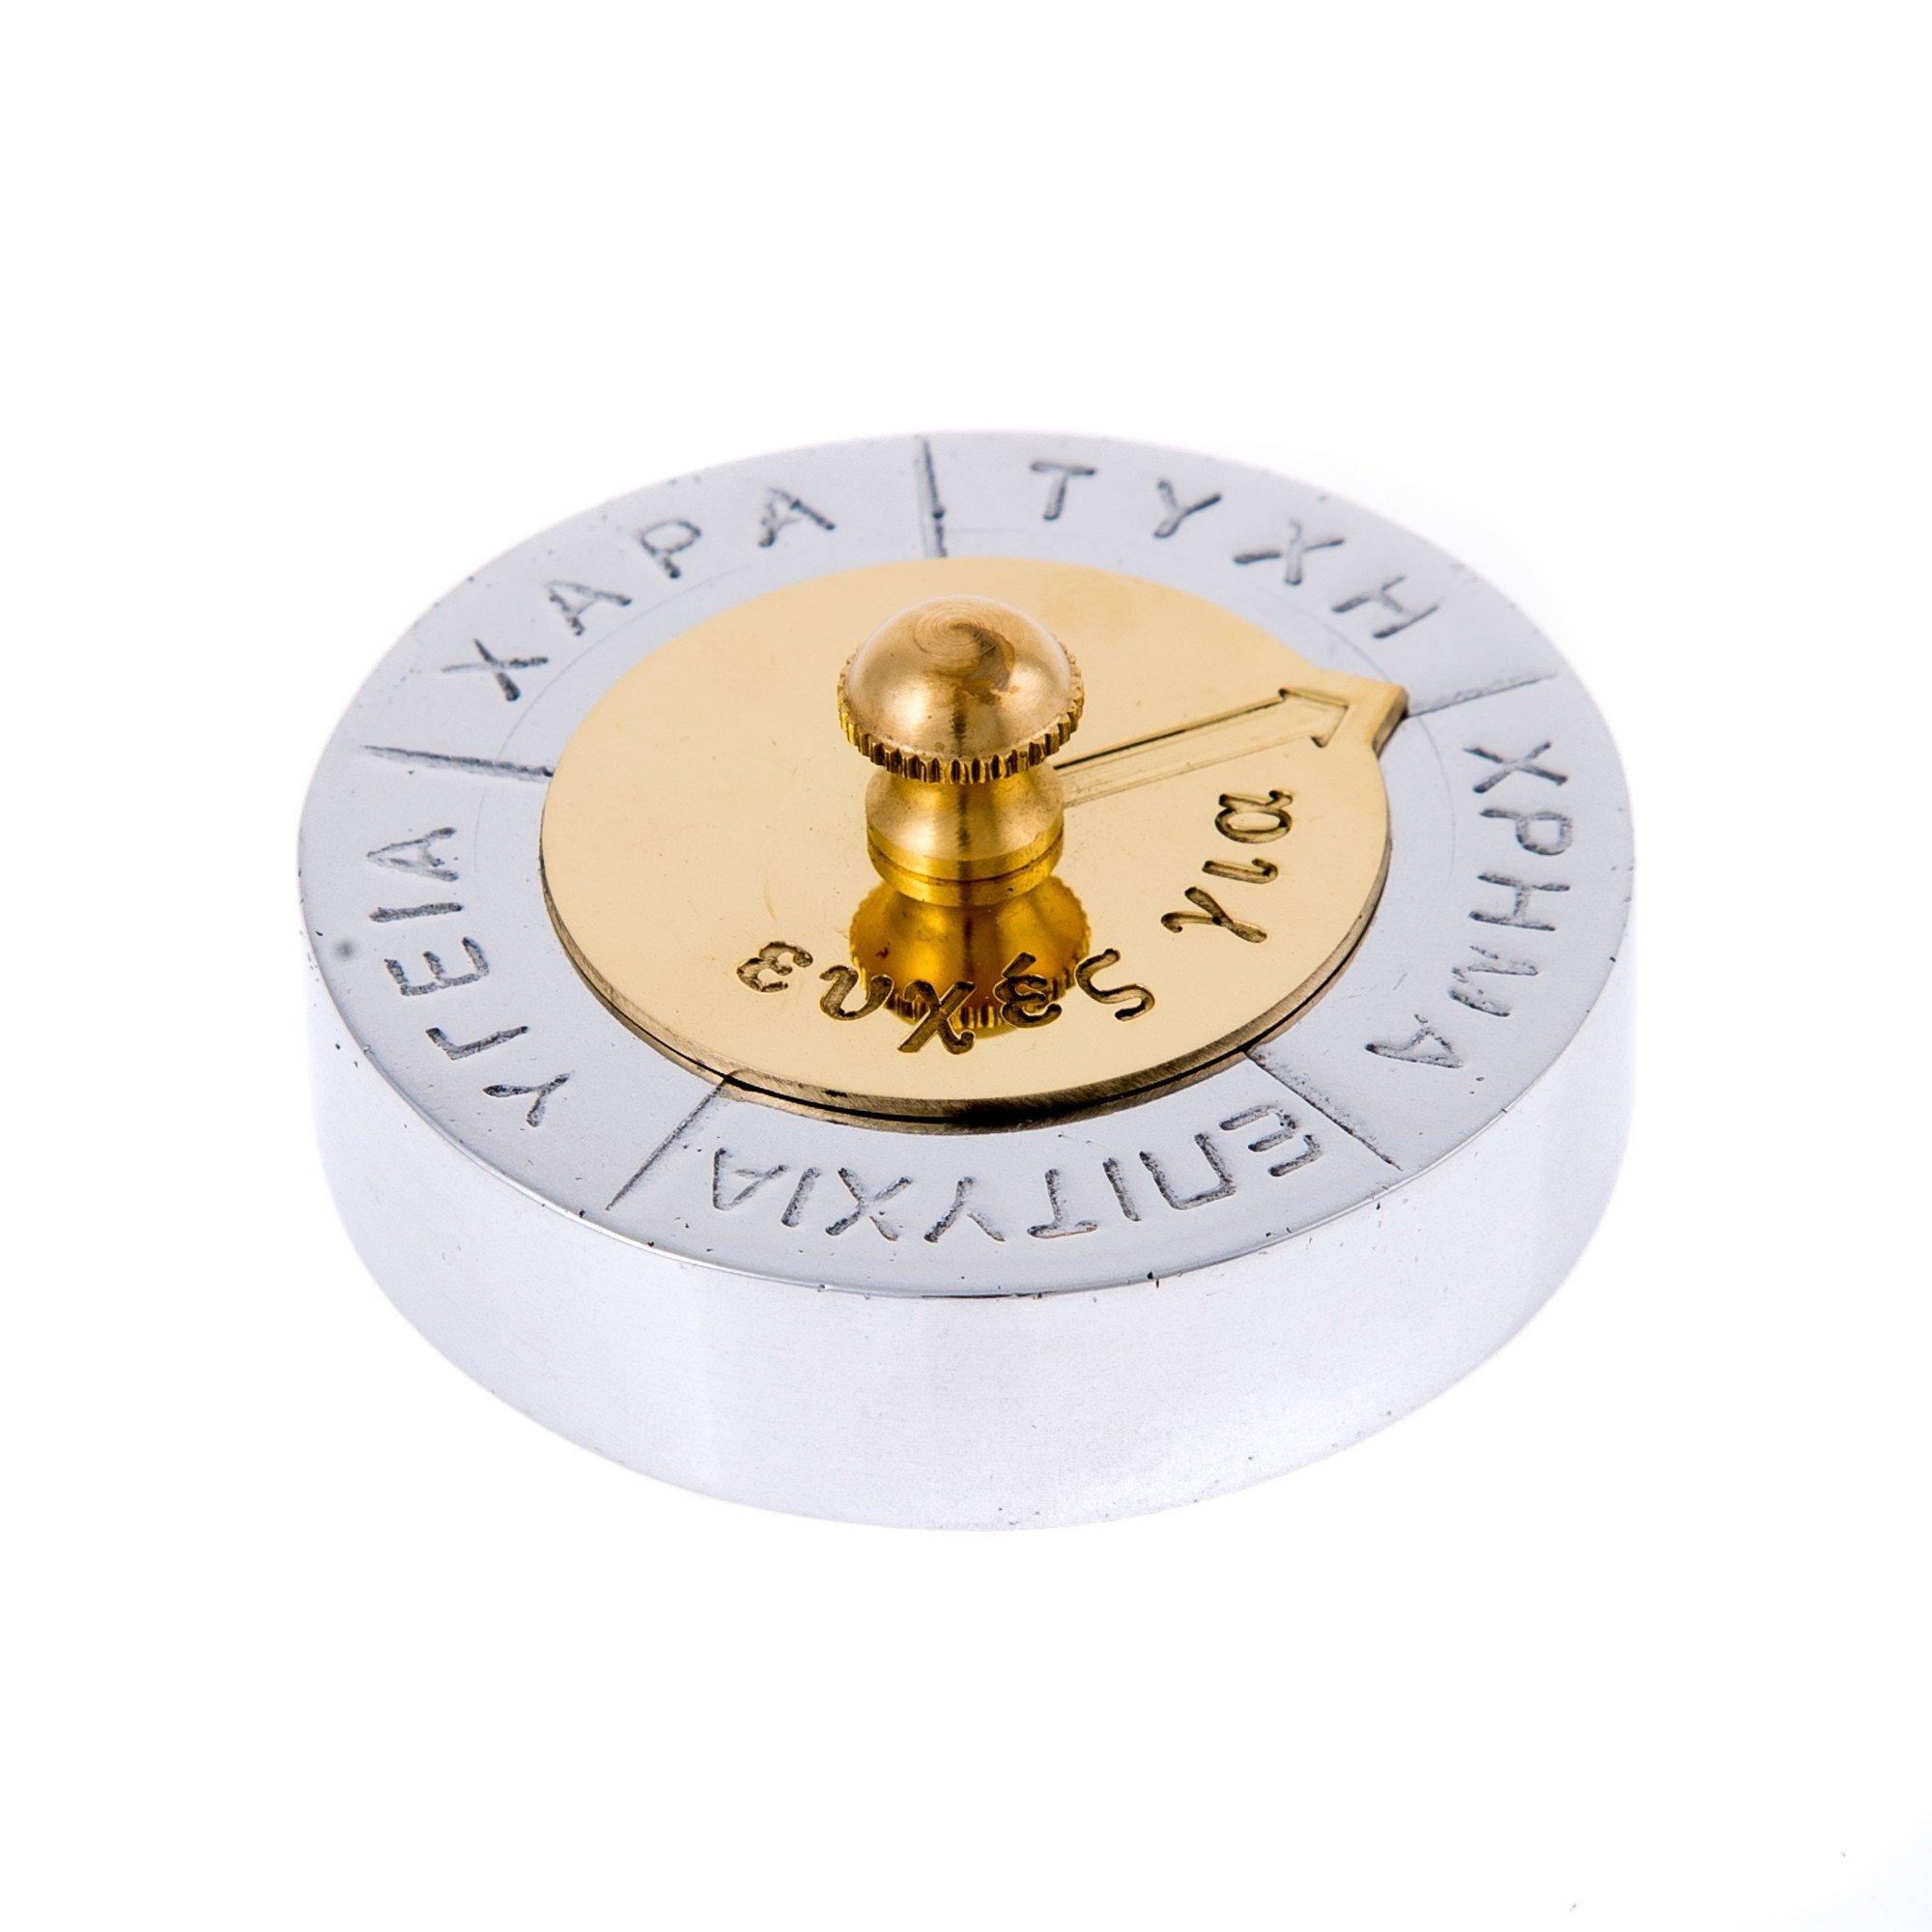 EliteCrafters Handmade Solid Metal, Desk Paperweight (Presse Papier), Roulette of Wishes Design, in Greek. Diam: 8.7cm, 3.4''